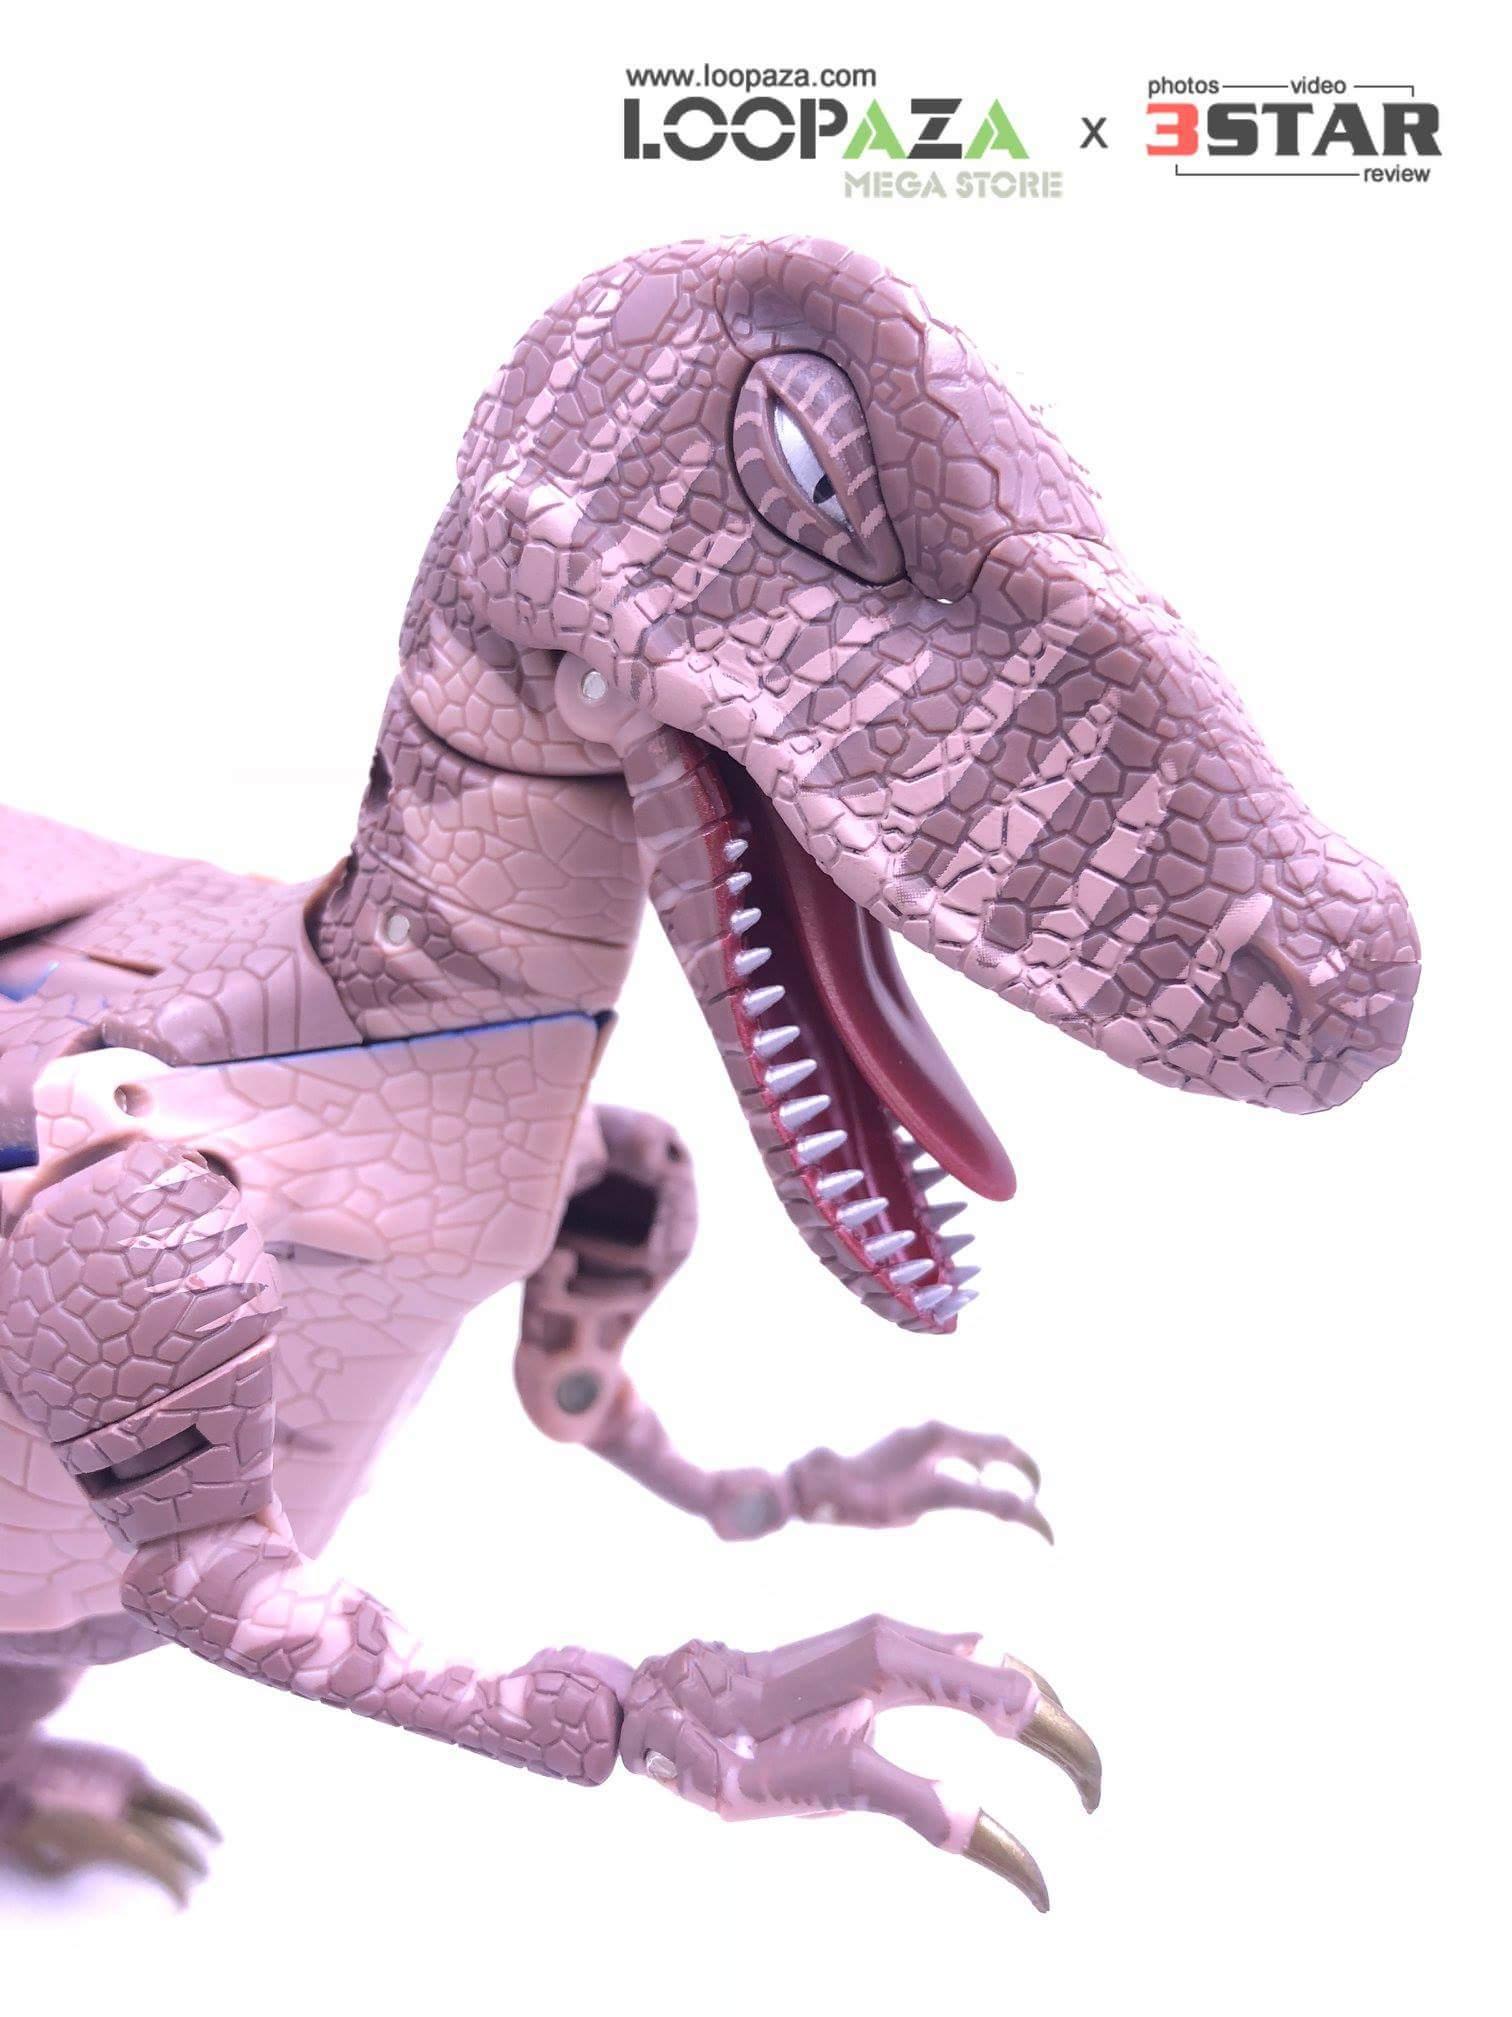 [Masterpiece] MP-41 Dinobot (Beast Wars) - Page 2 LGFJTurp_o